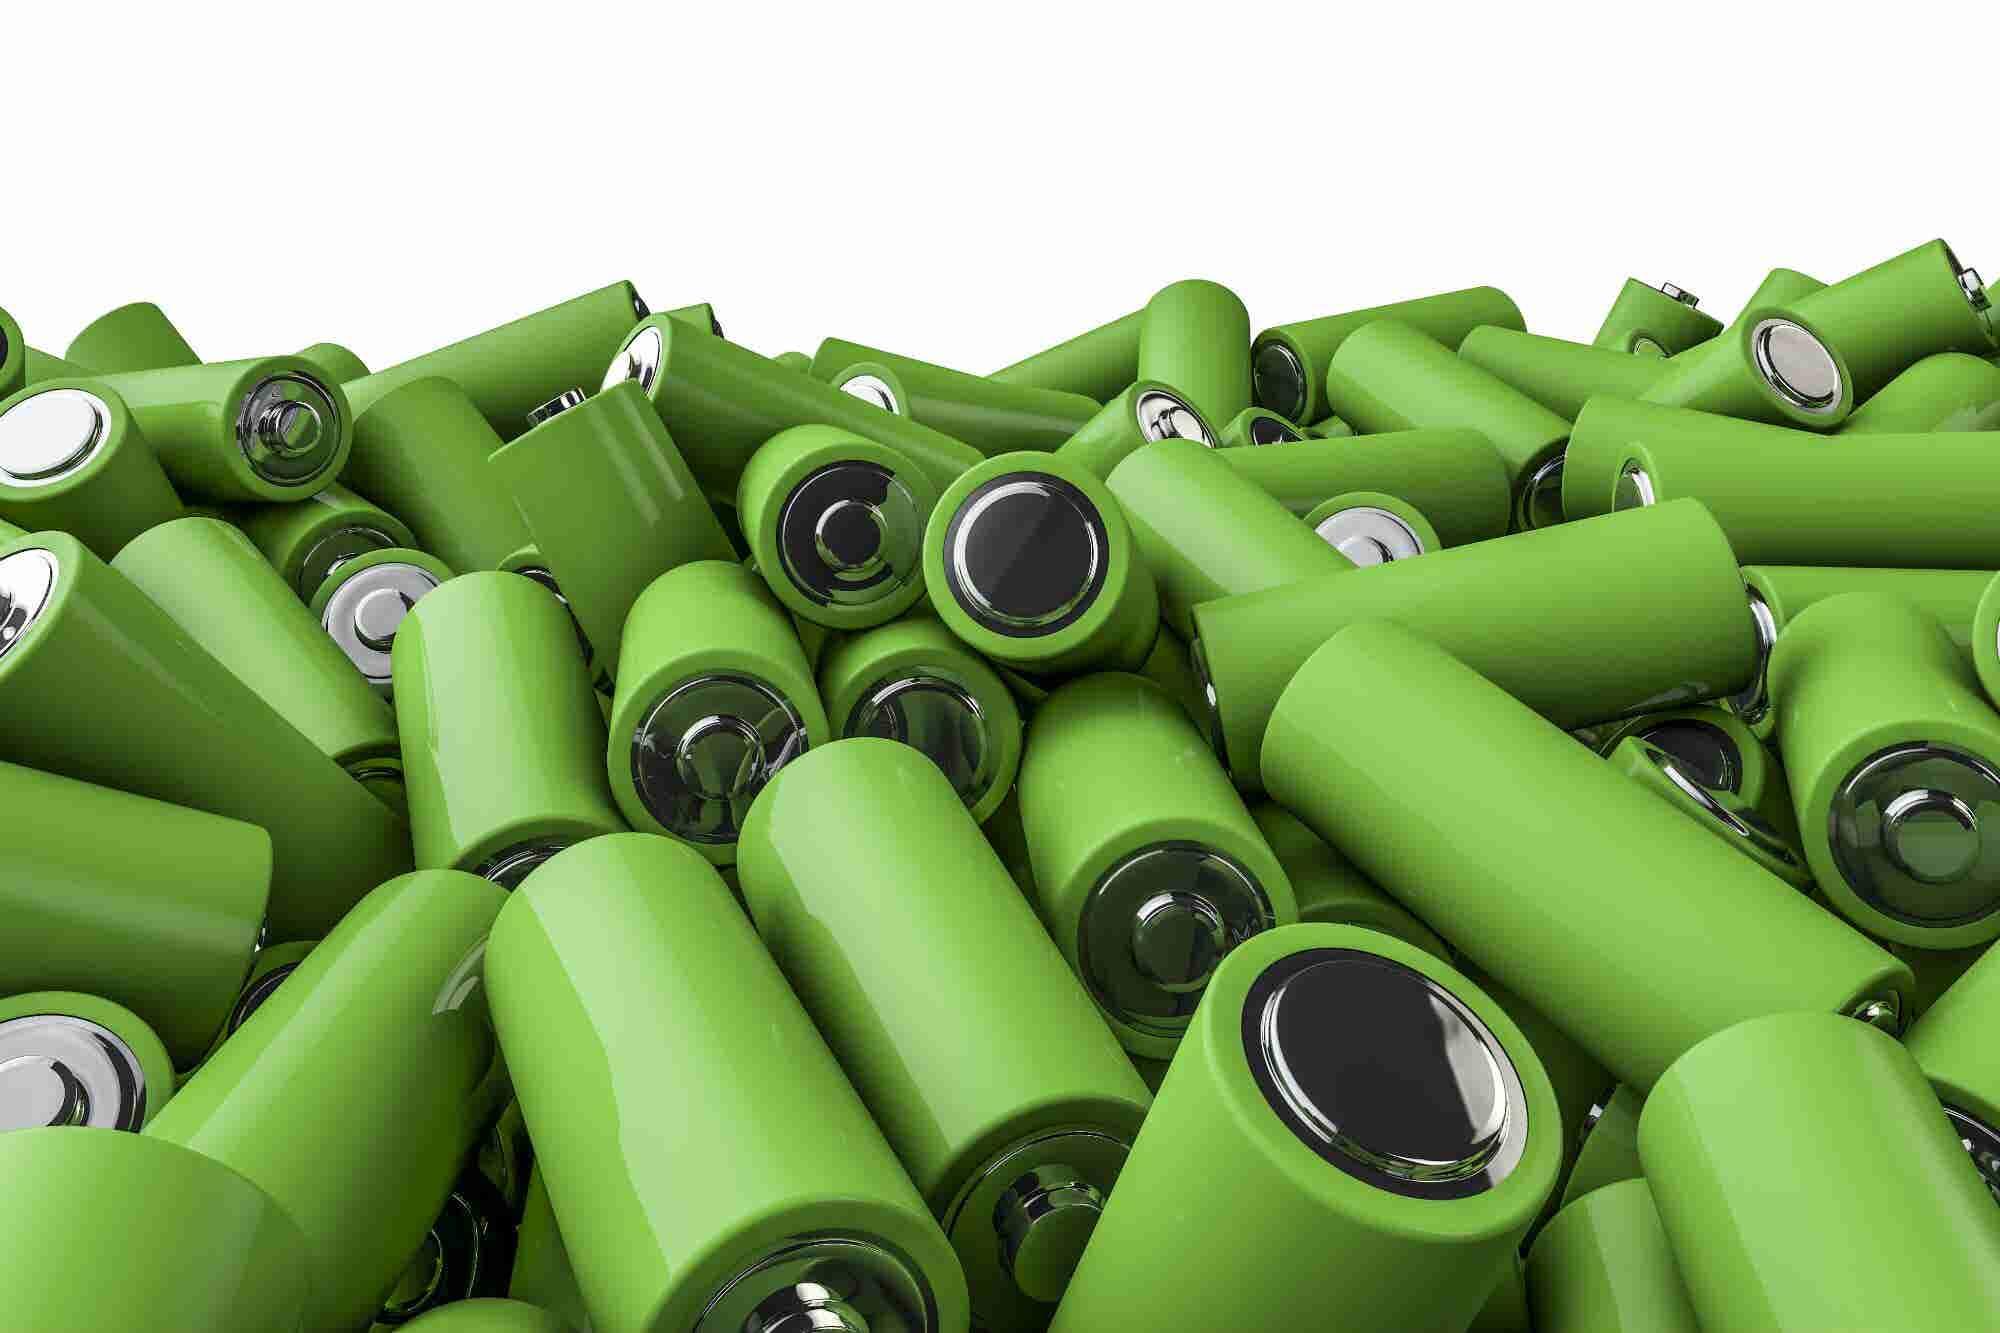 ¿Baterías de papel biodegradable? Ya es posible